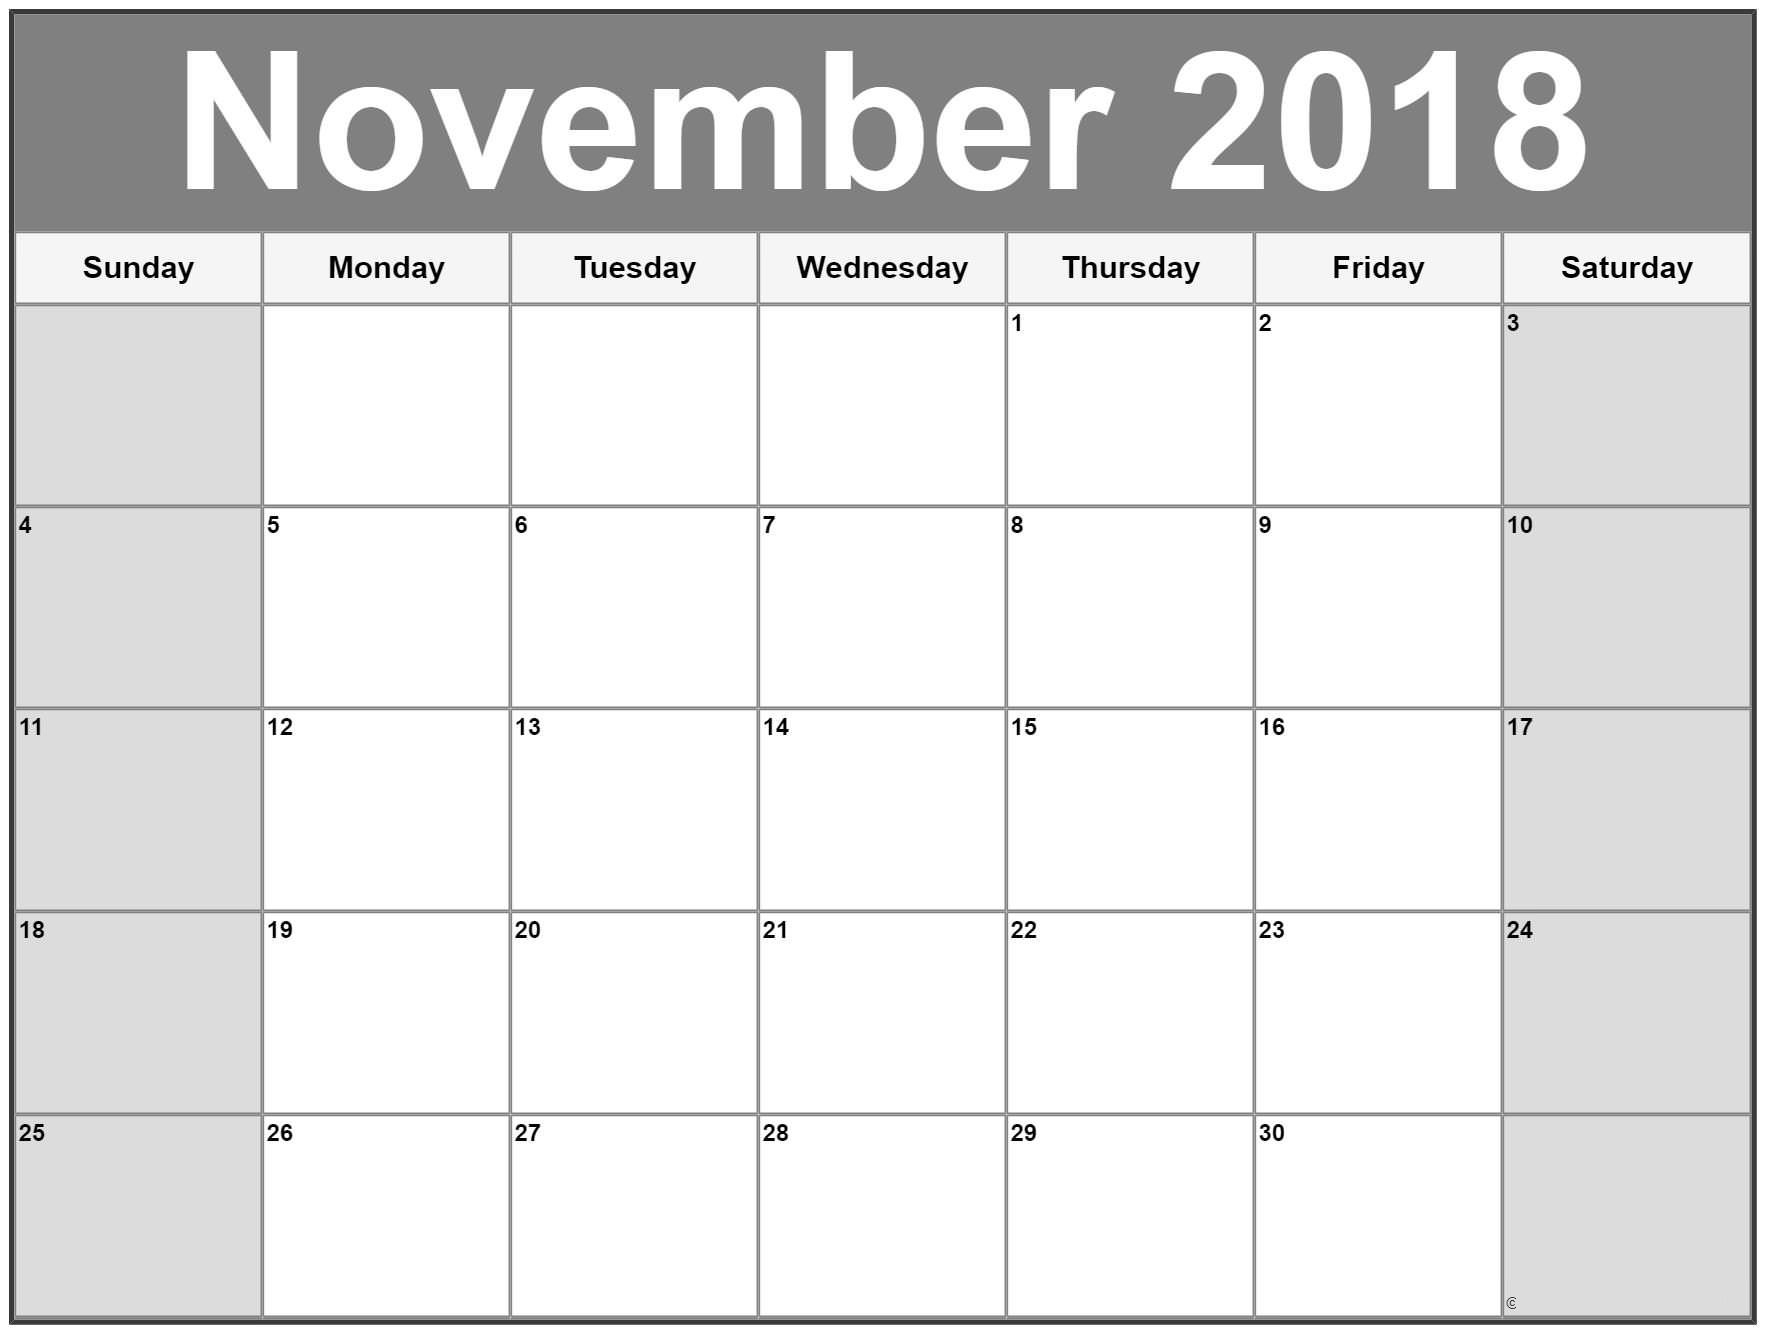 Print November 2018 Calendar Microsoft Online   125+ November 2018 within Microsoft November Calendar Templates